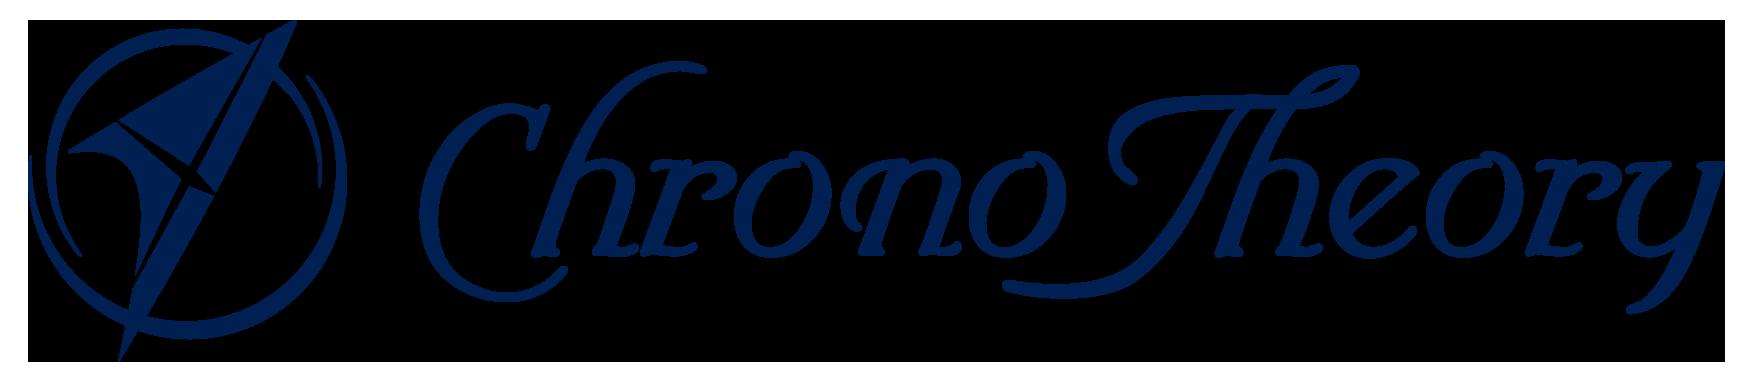 Chrono Theory – クロノセオリー